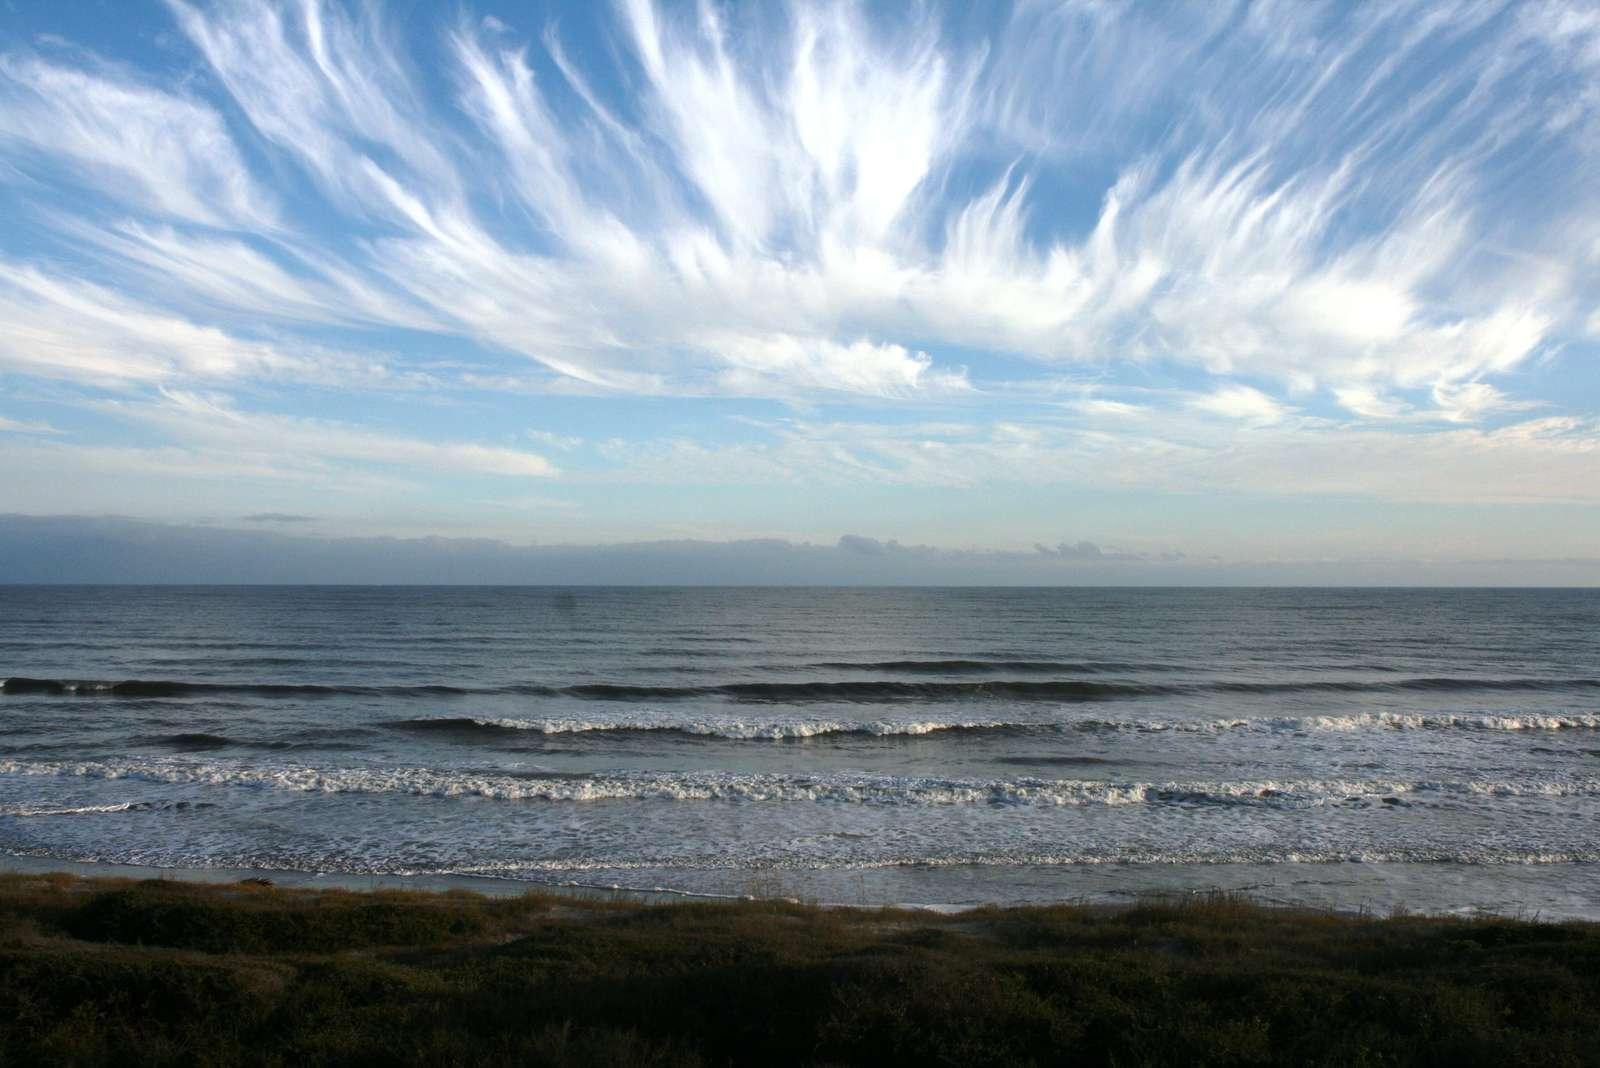 Cloud Art at Kiawah